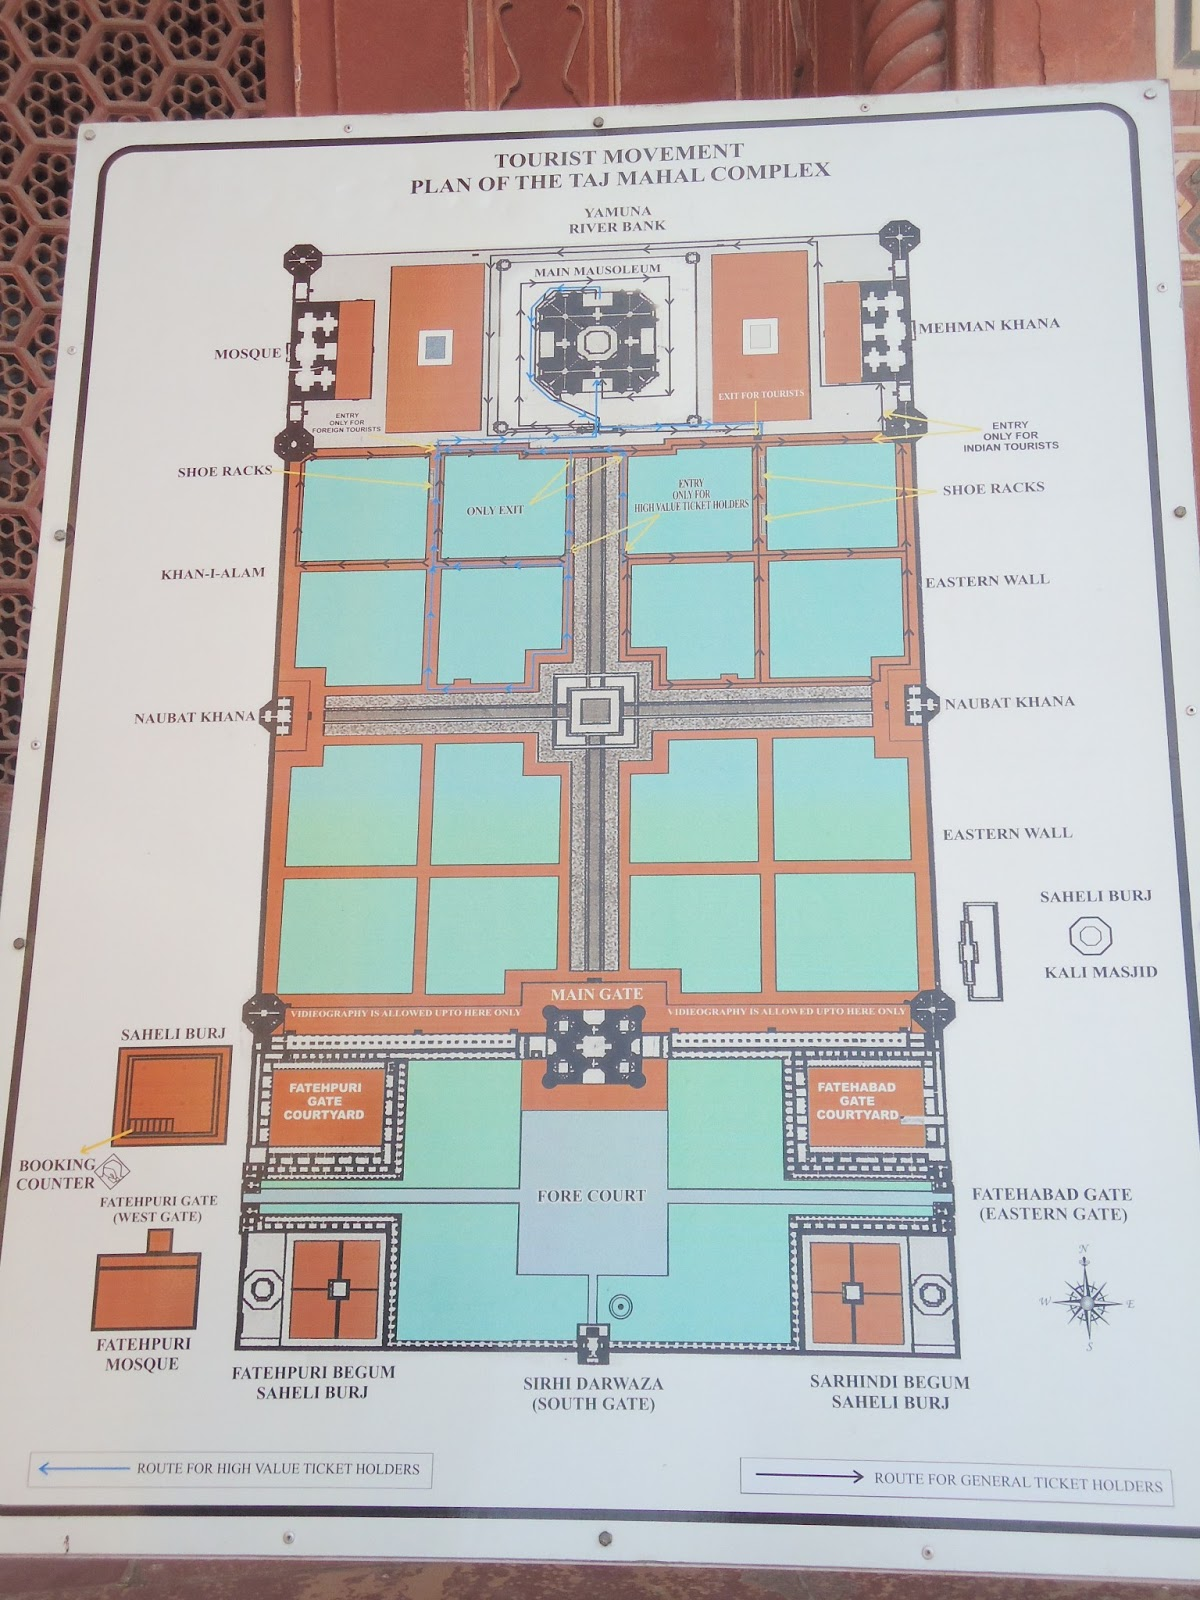 taj mahal floor plan free download wiring diagram hdmi wiring schematic diagram 2004 dodge dakota wiring schematic diagram